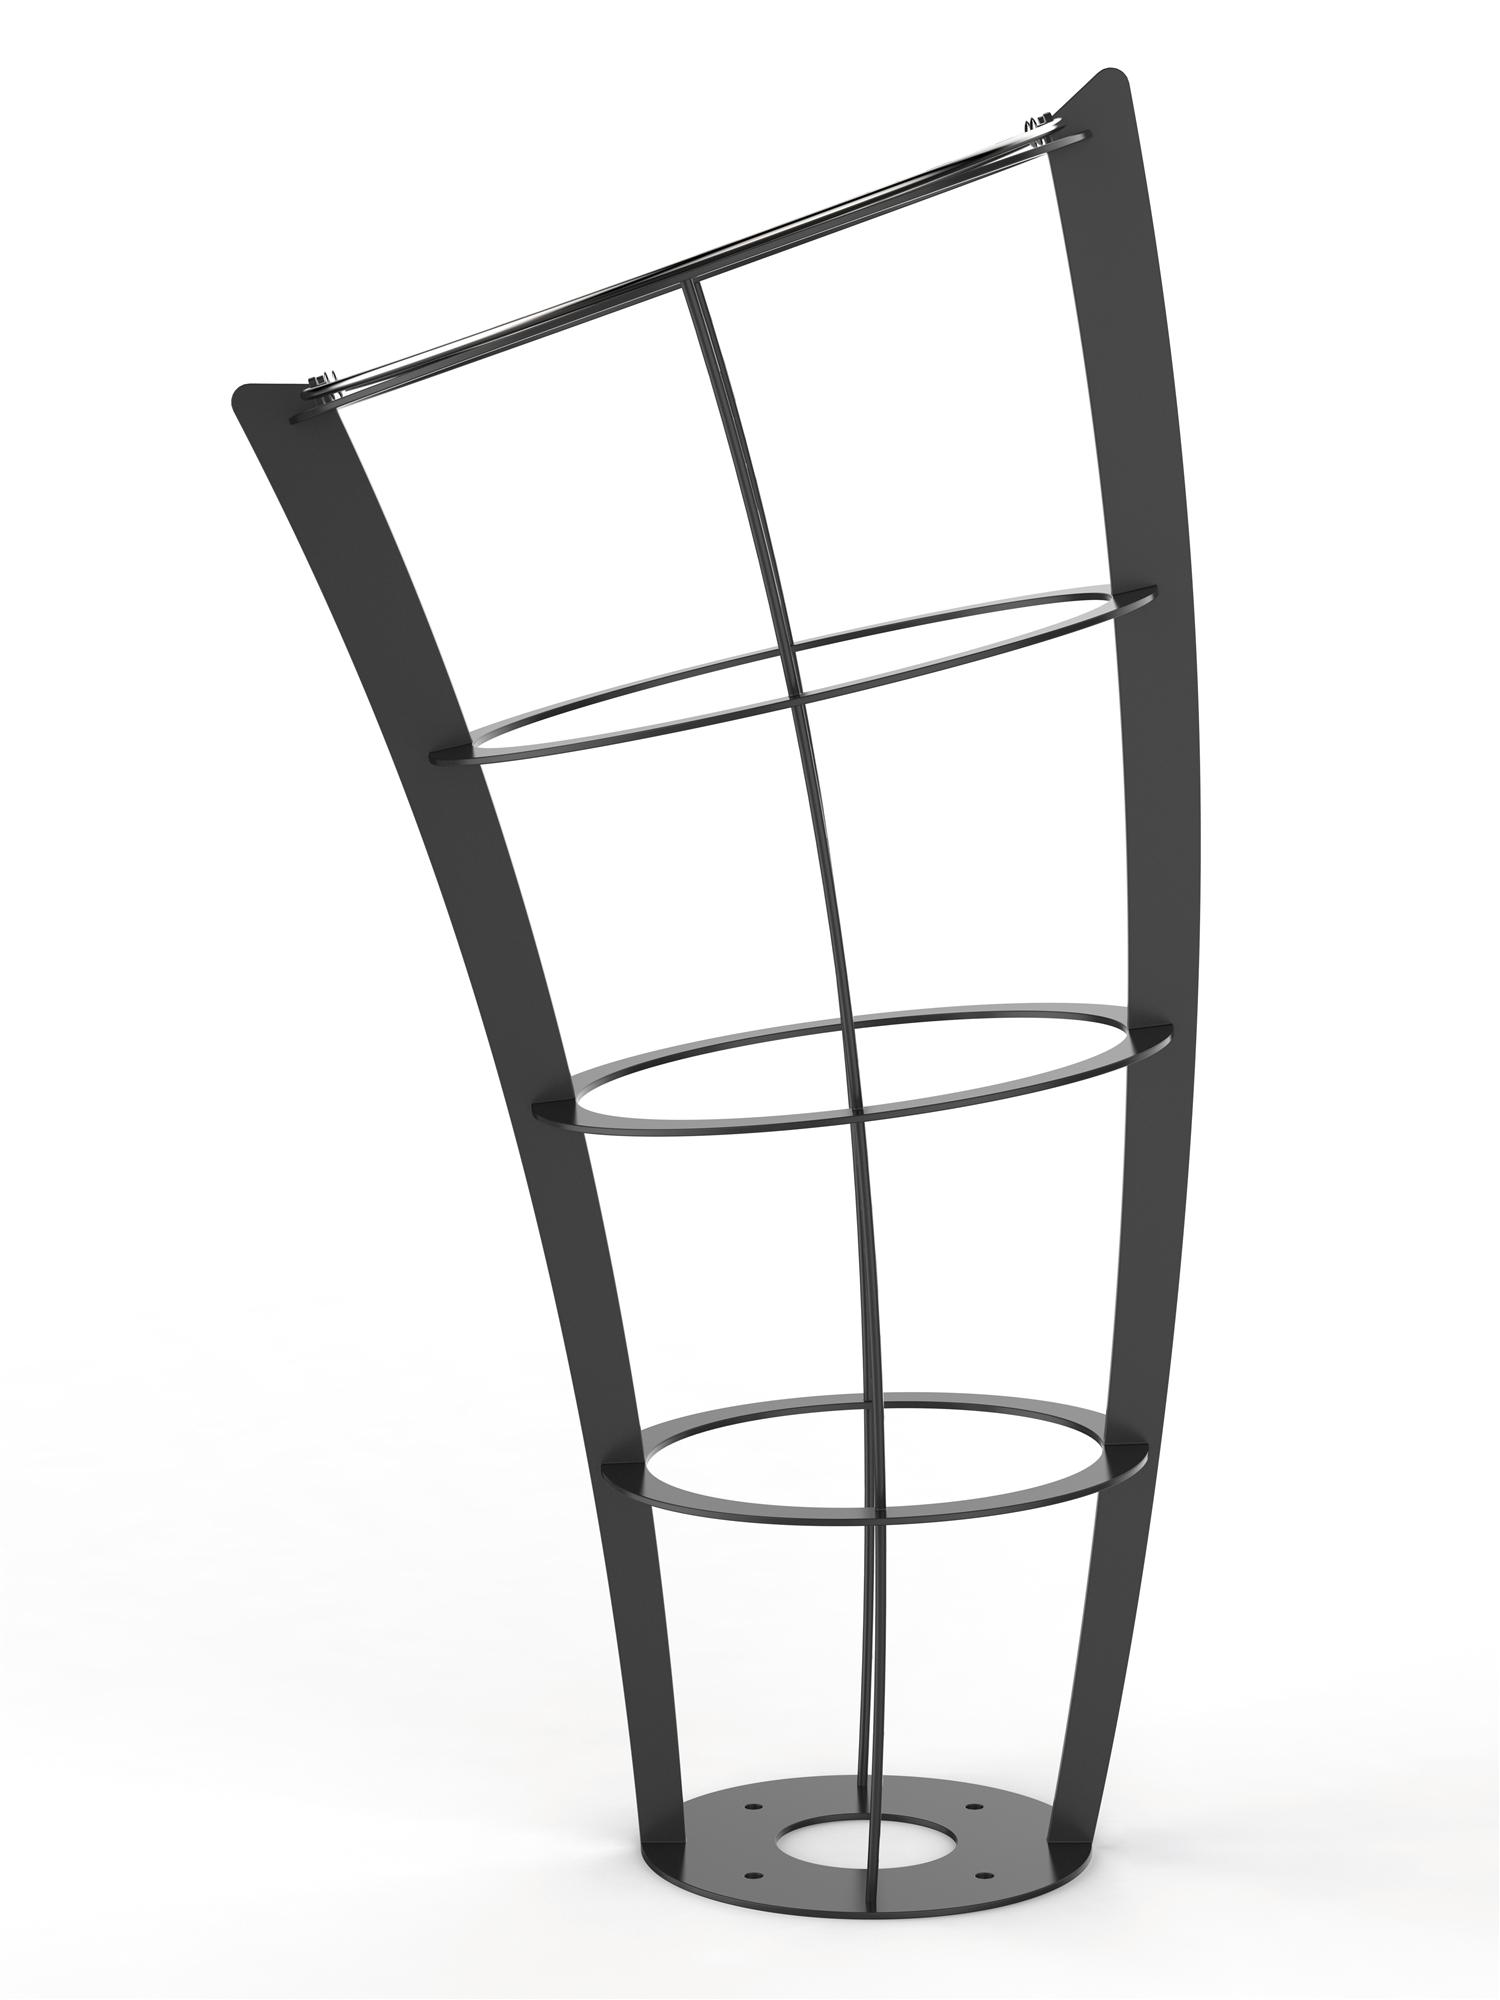 poubelle vigipirate de ville rossignol gris manganese. Black Bedroom Furniture Sets. Home Design Ideas